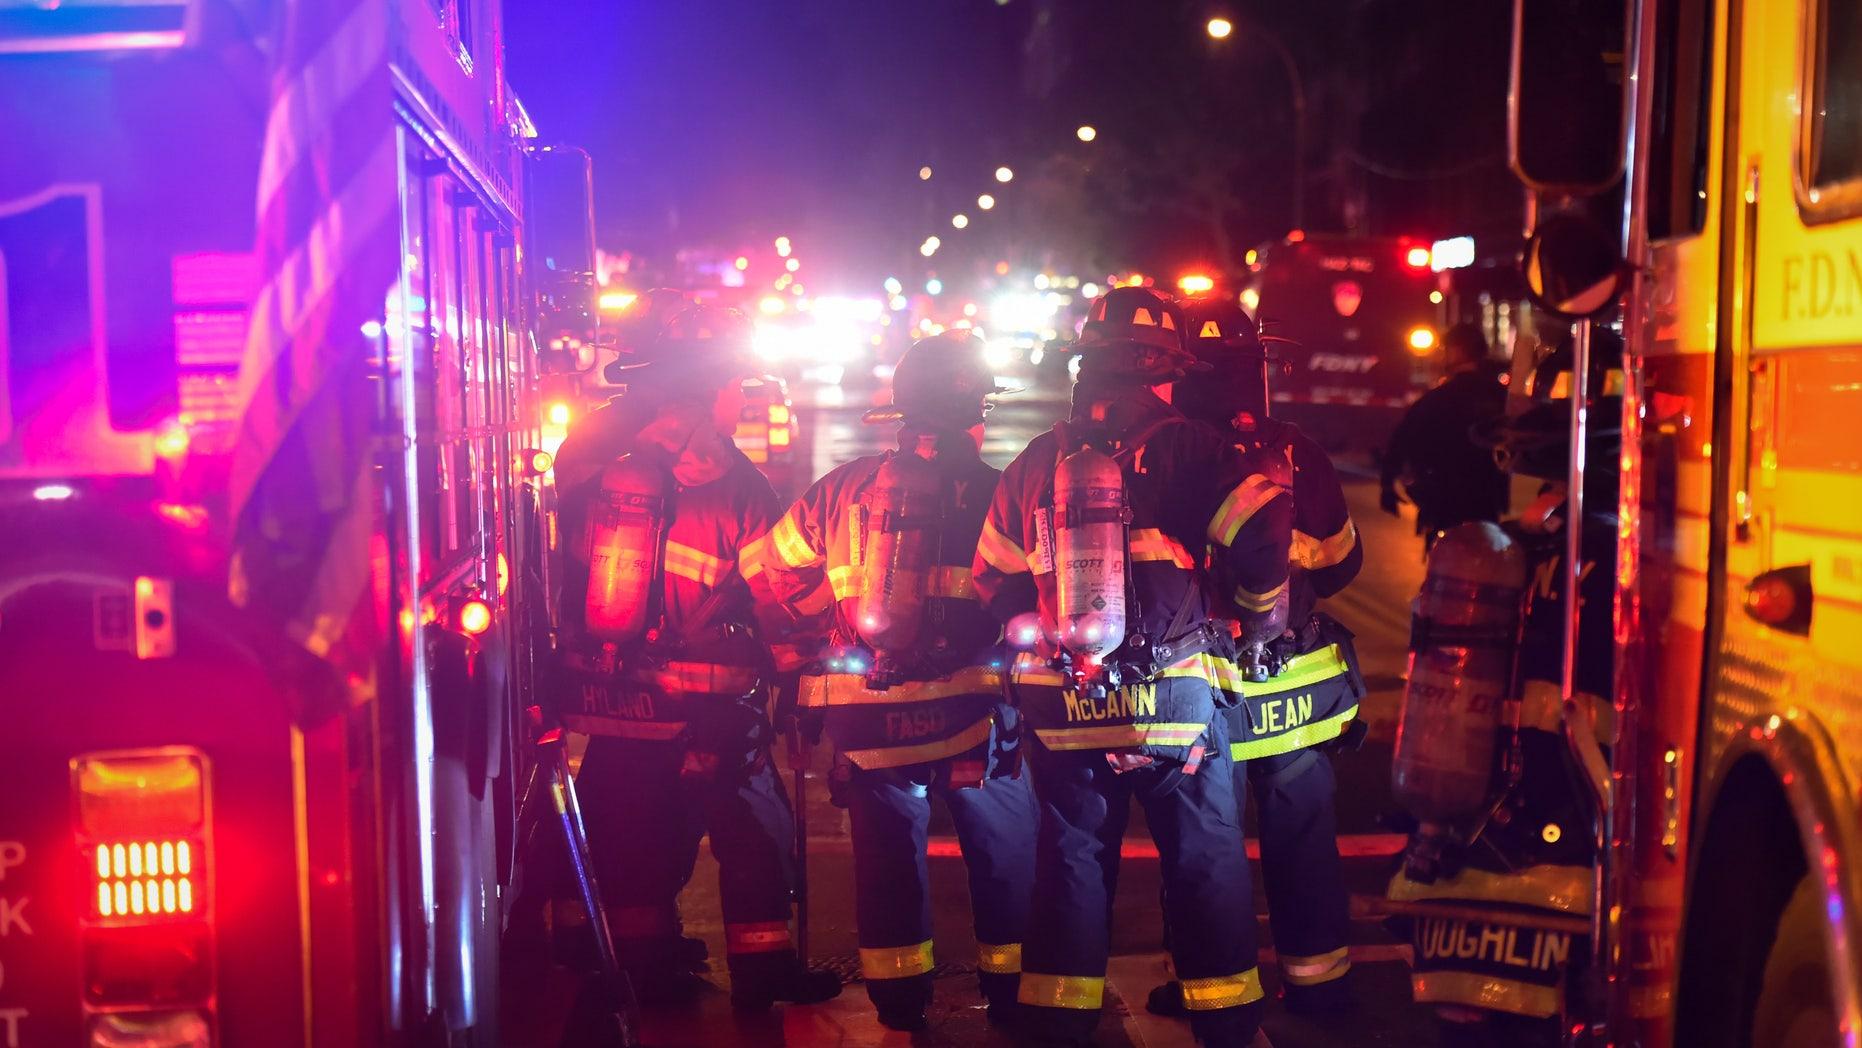 New York City firefighters stand near the site of an explosion in the Chelsea neighborhood of Manhattan, New York, U.S. September 17, 2016. (REUTERS/Rashid Umar Abbasi)